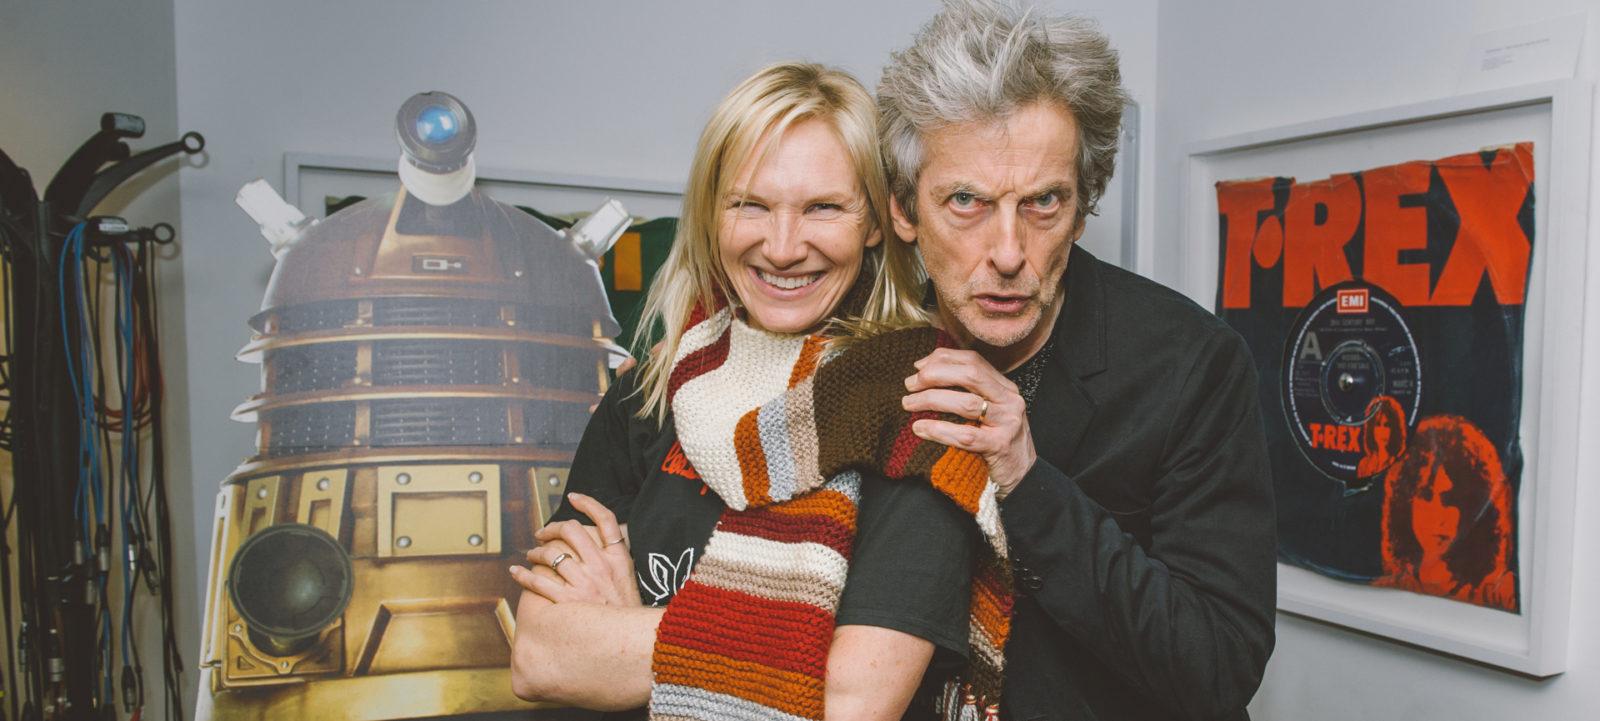 Peter Capaldi and BBC Radio 2's Jo Whiley (Photo: BBC)